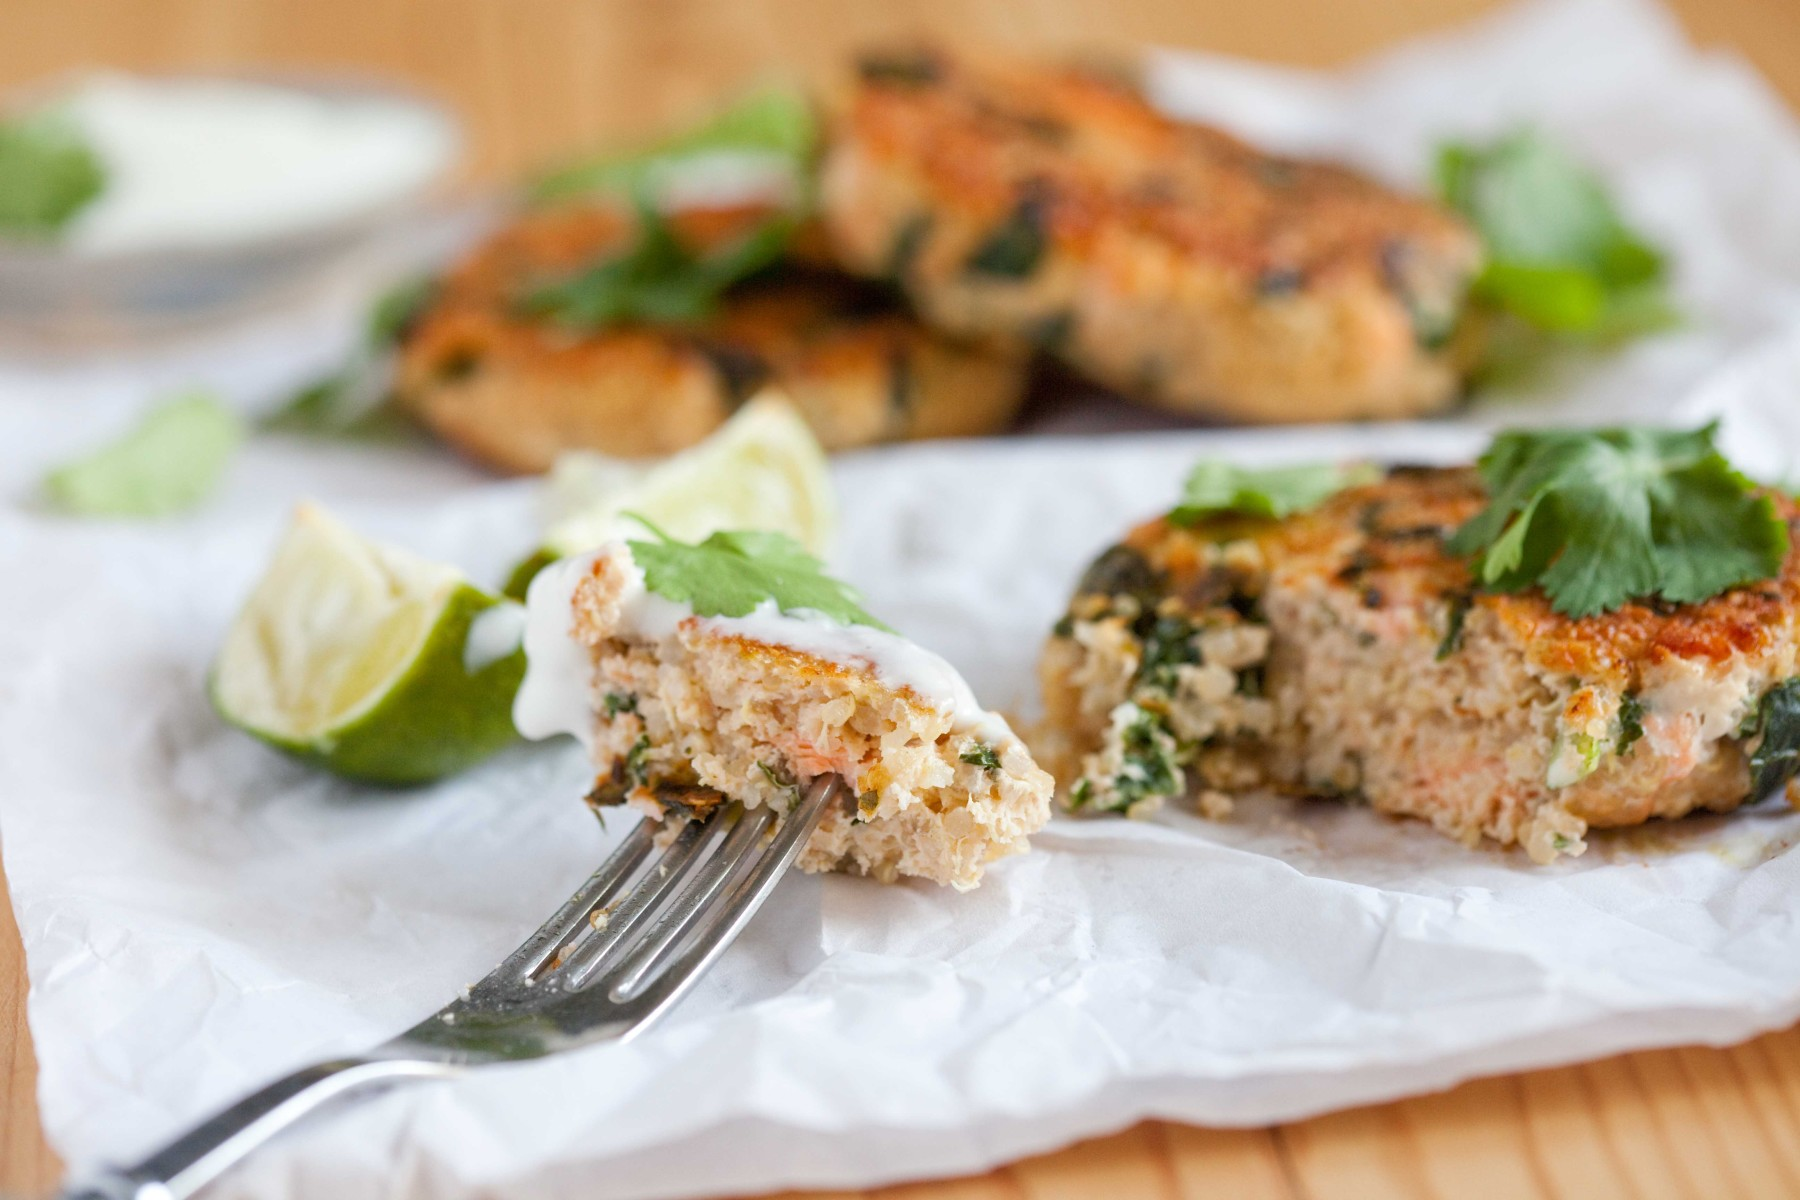 kotleciki-z-lososia-kaszy-quinoa-jarmuz